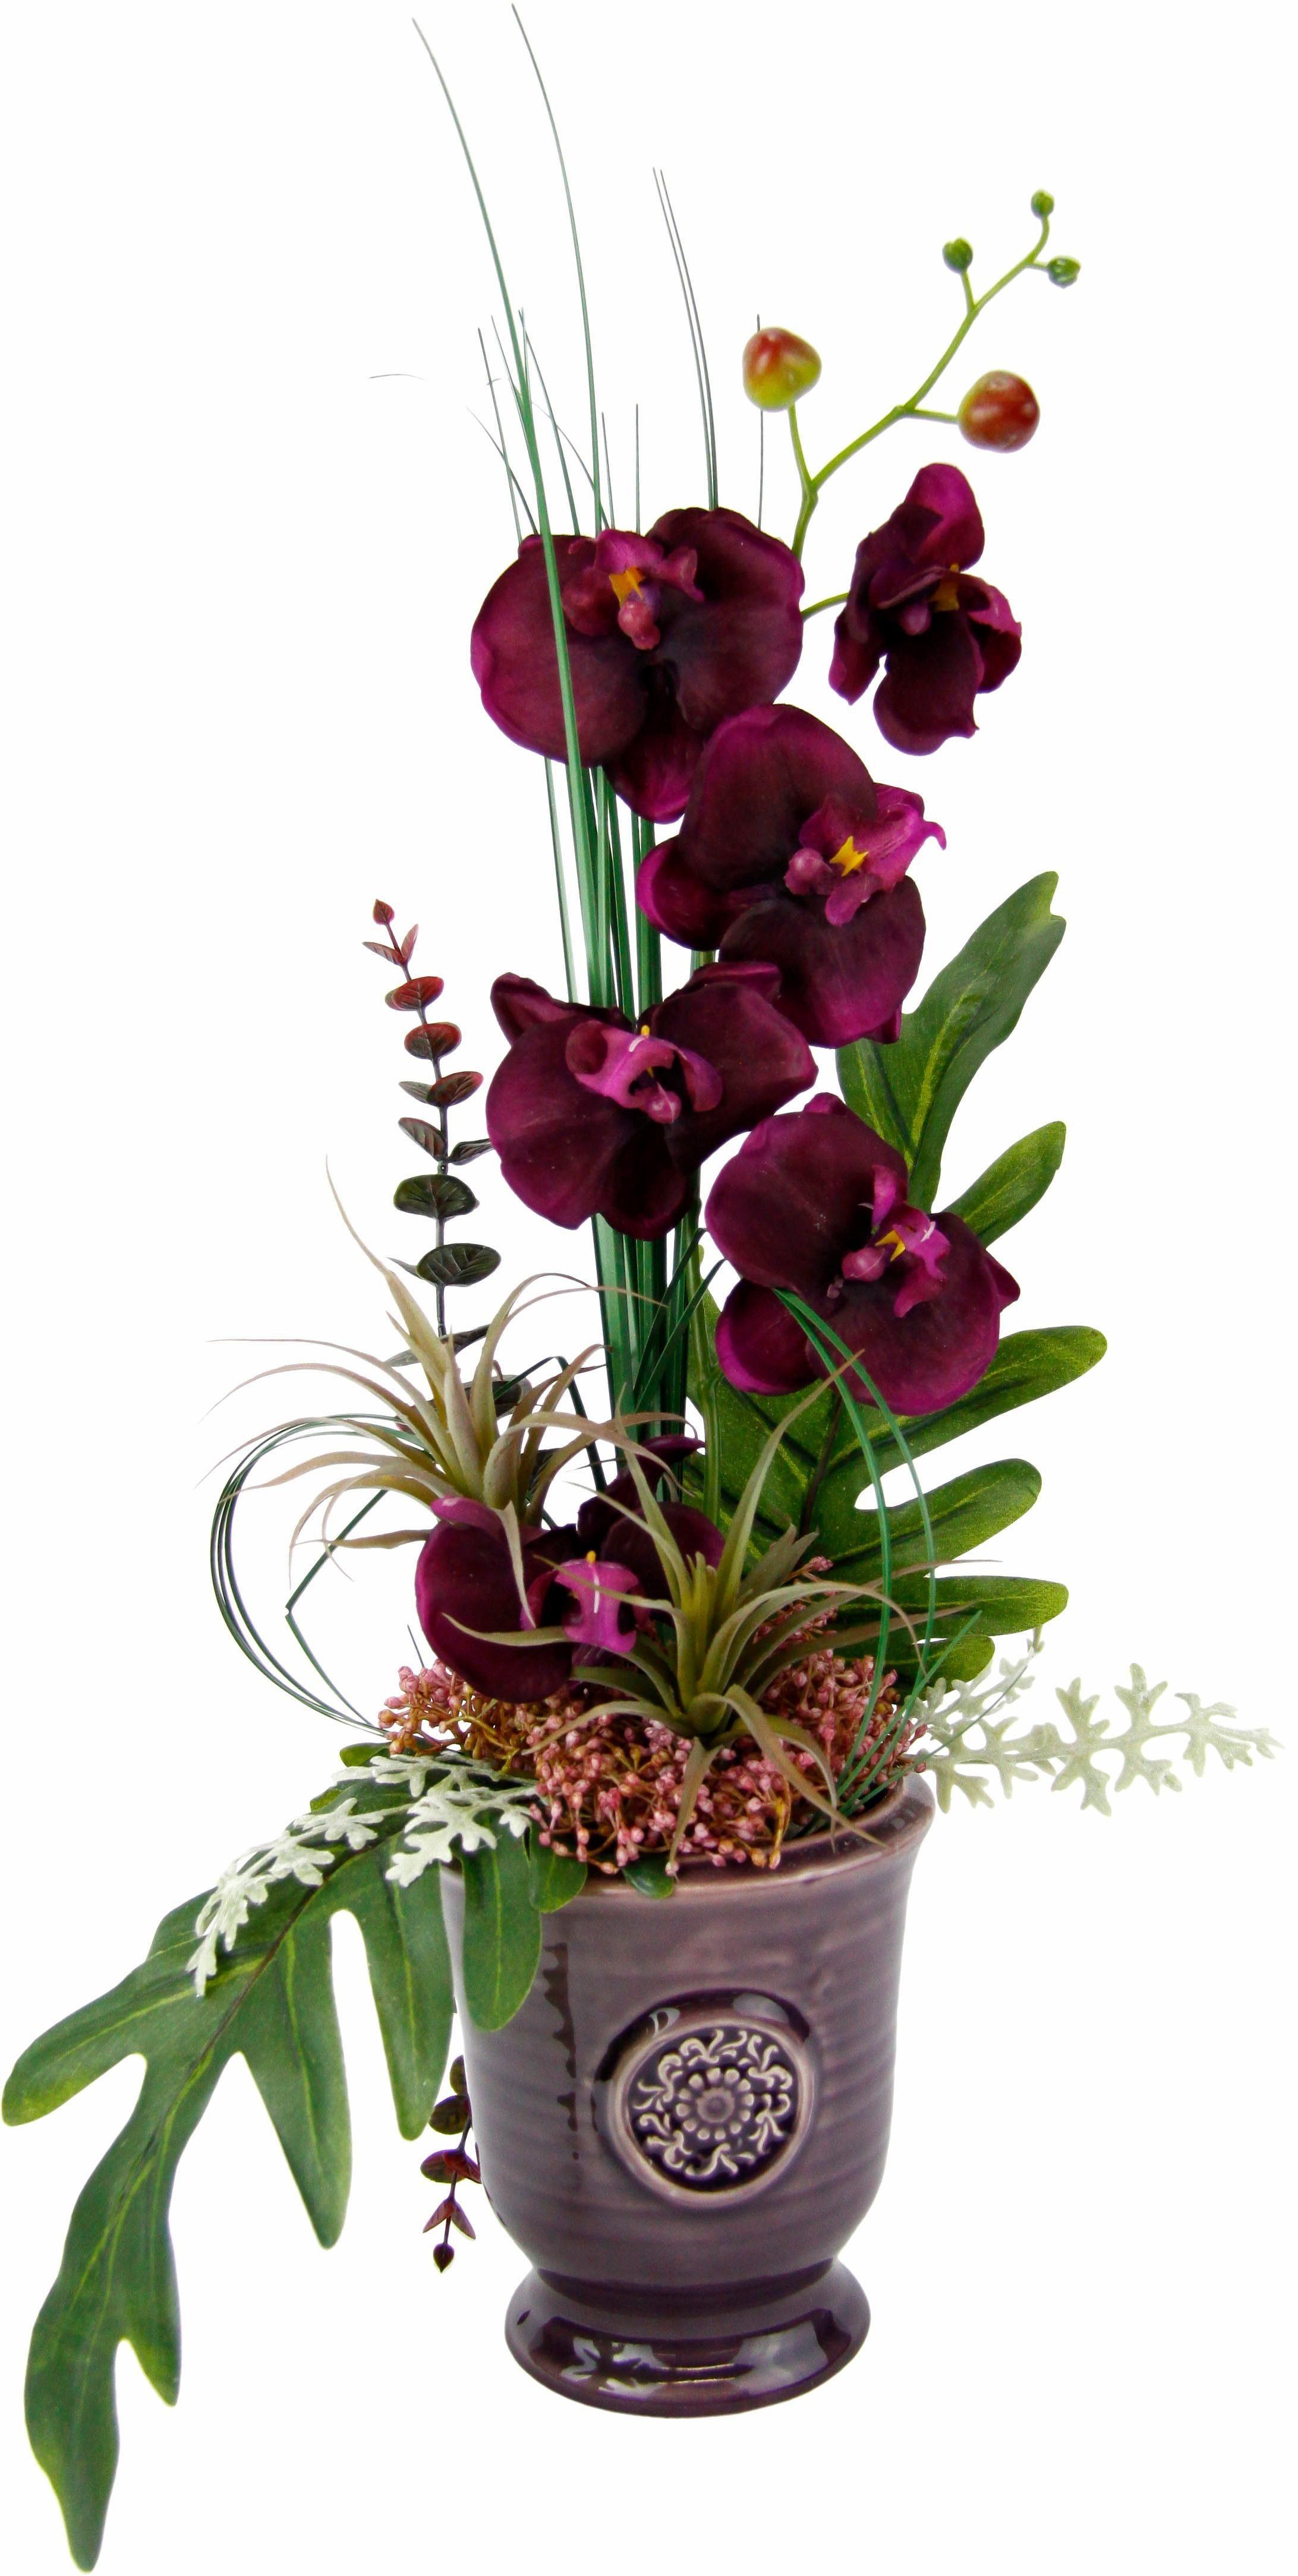 Home affaire Kunstblume »Orchidee« im Topf